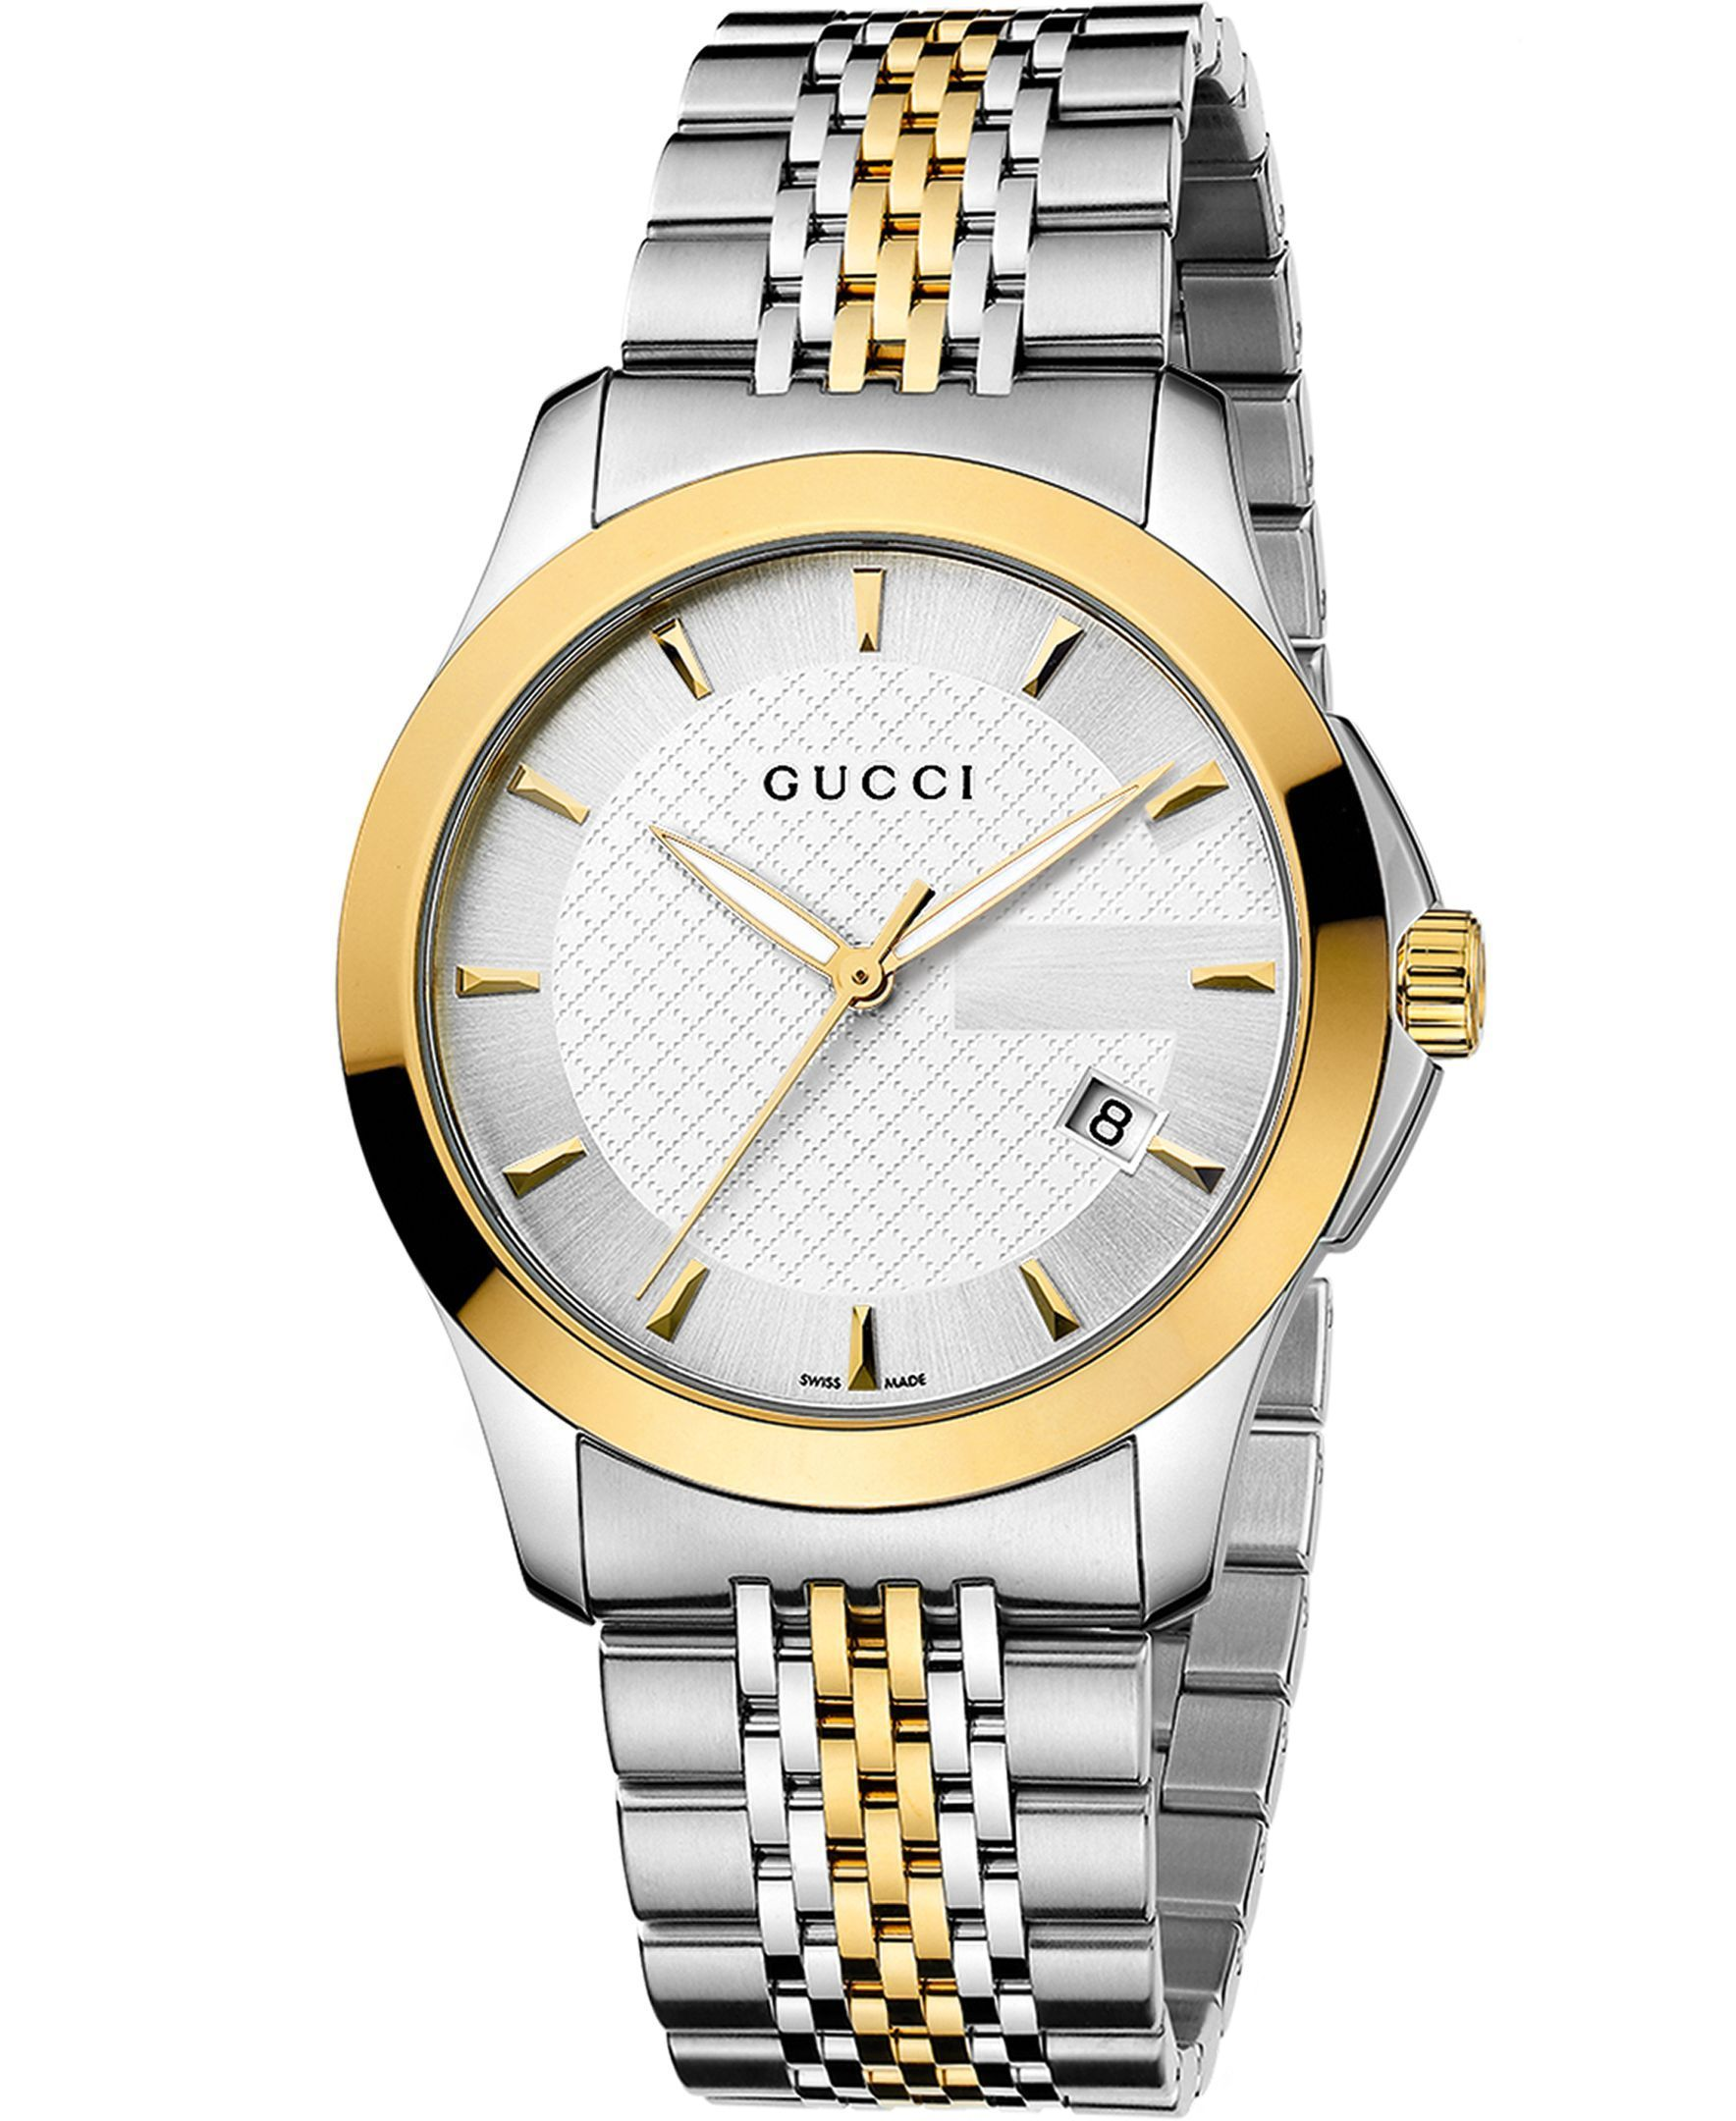 94bce902aeb Gucci Twirl Gold Dial Ladies Two Tone Bangle Watch YA112444